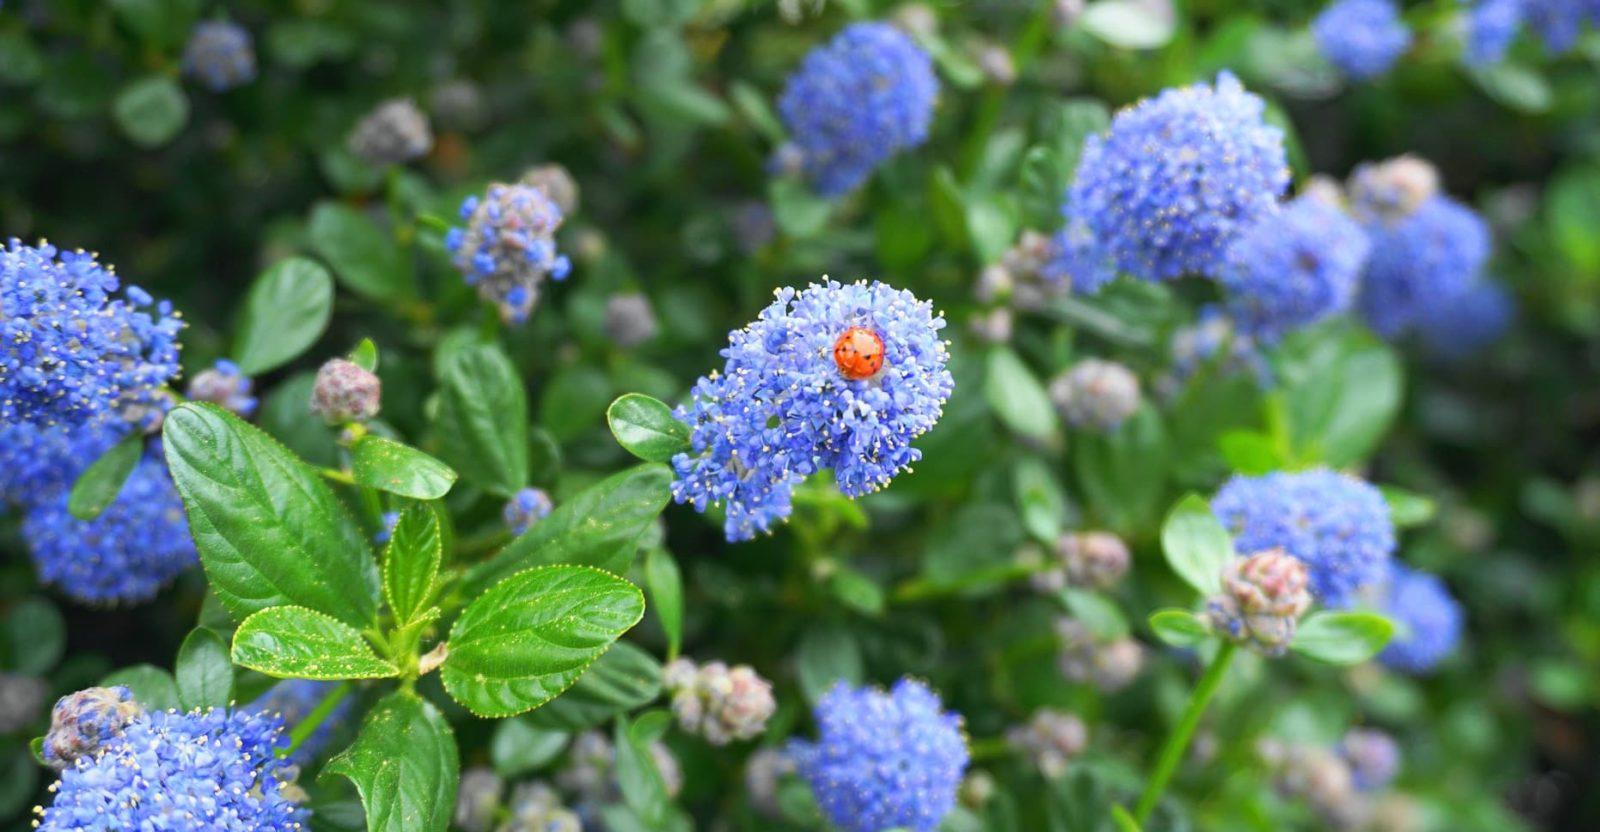 ladybird sat on blue ceanothus blossoms